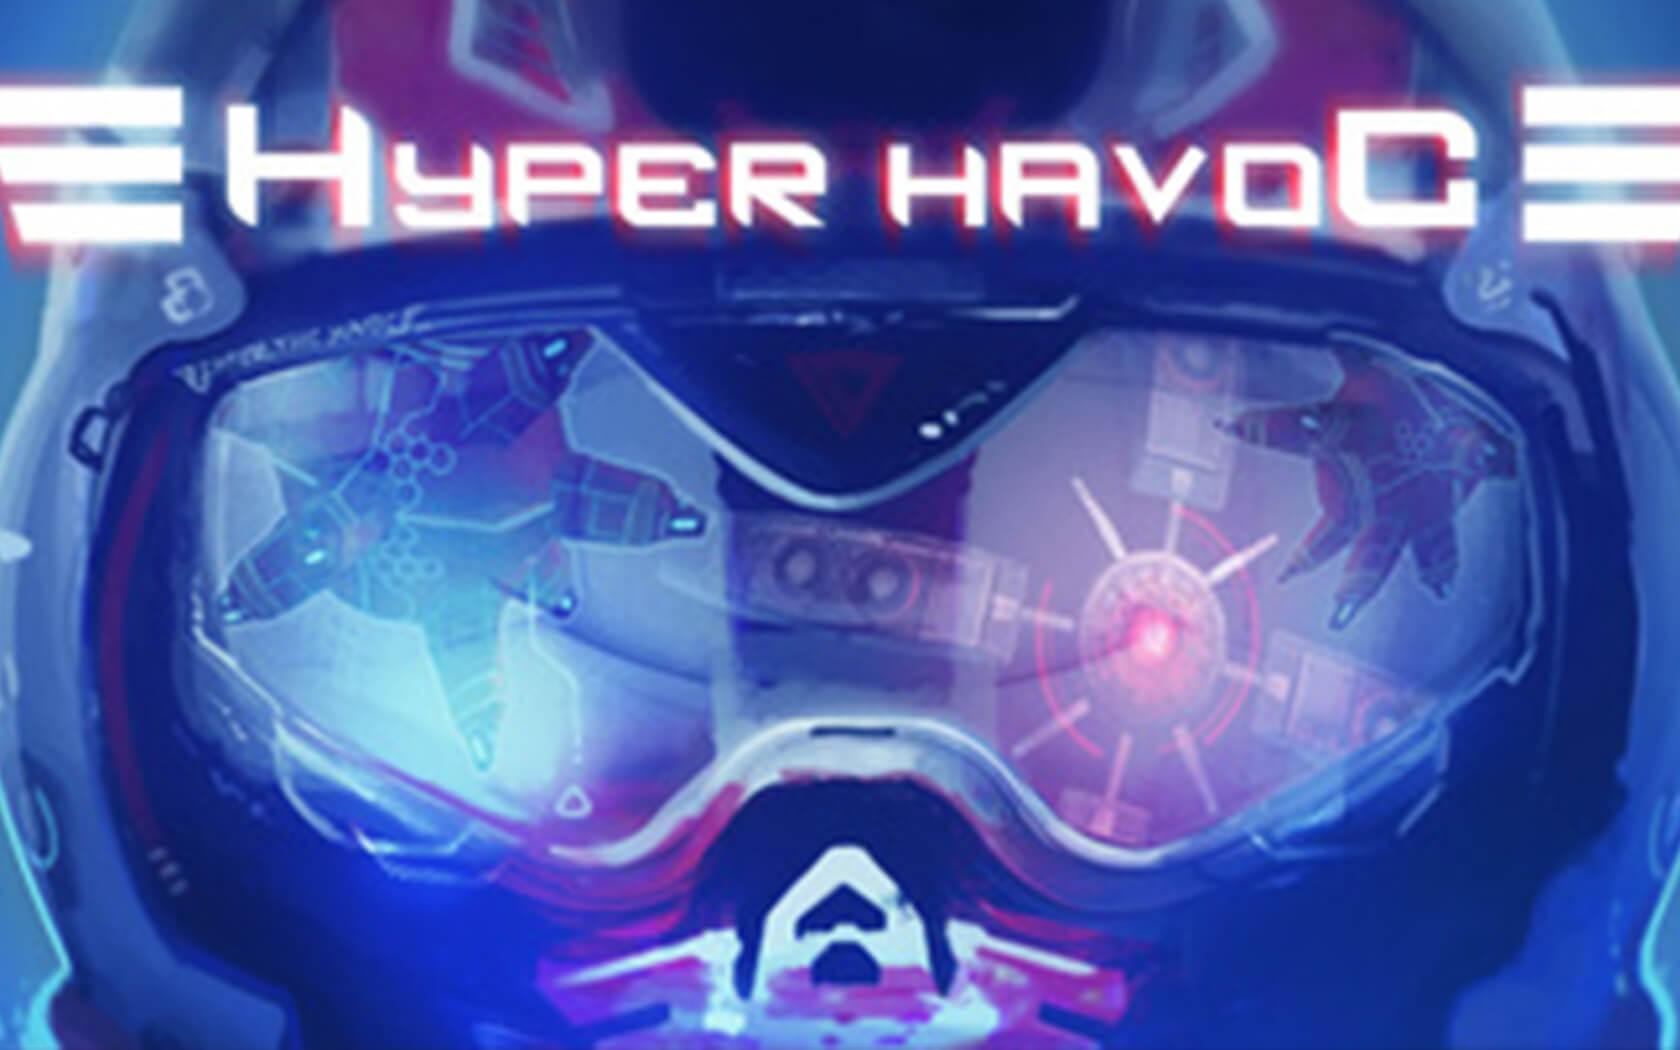 hyper havoc - ashton morris sfx